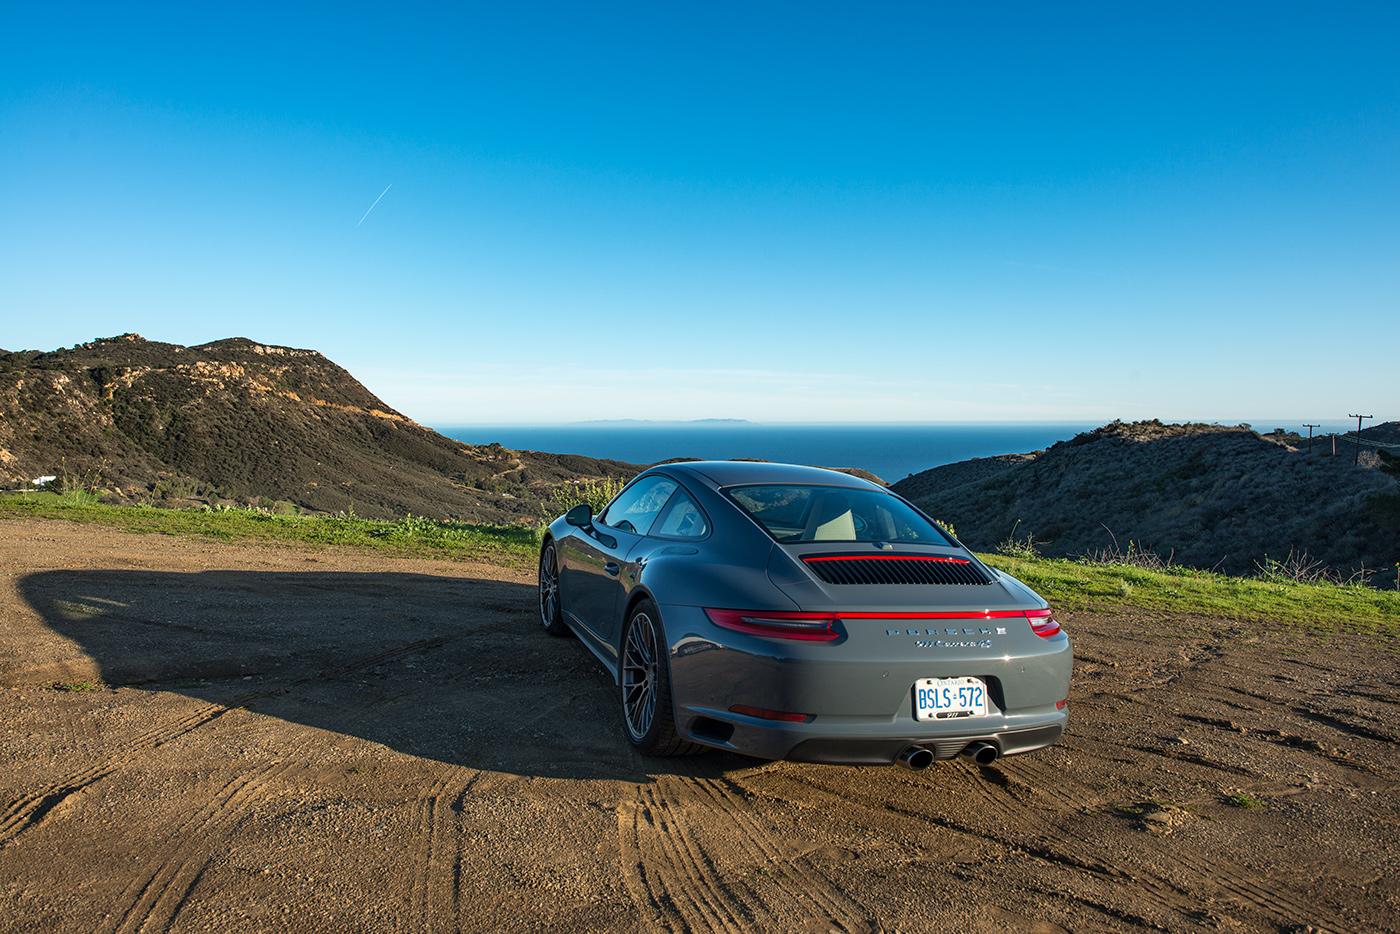 TrackWorthy - Porsche 911 C4S 991.2 - Canyon Roads - 06